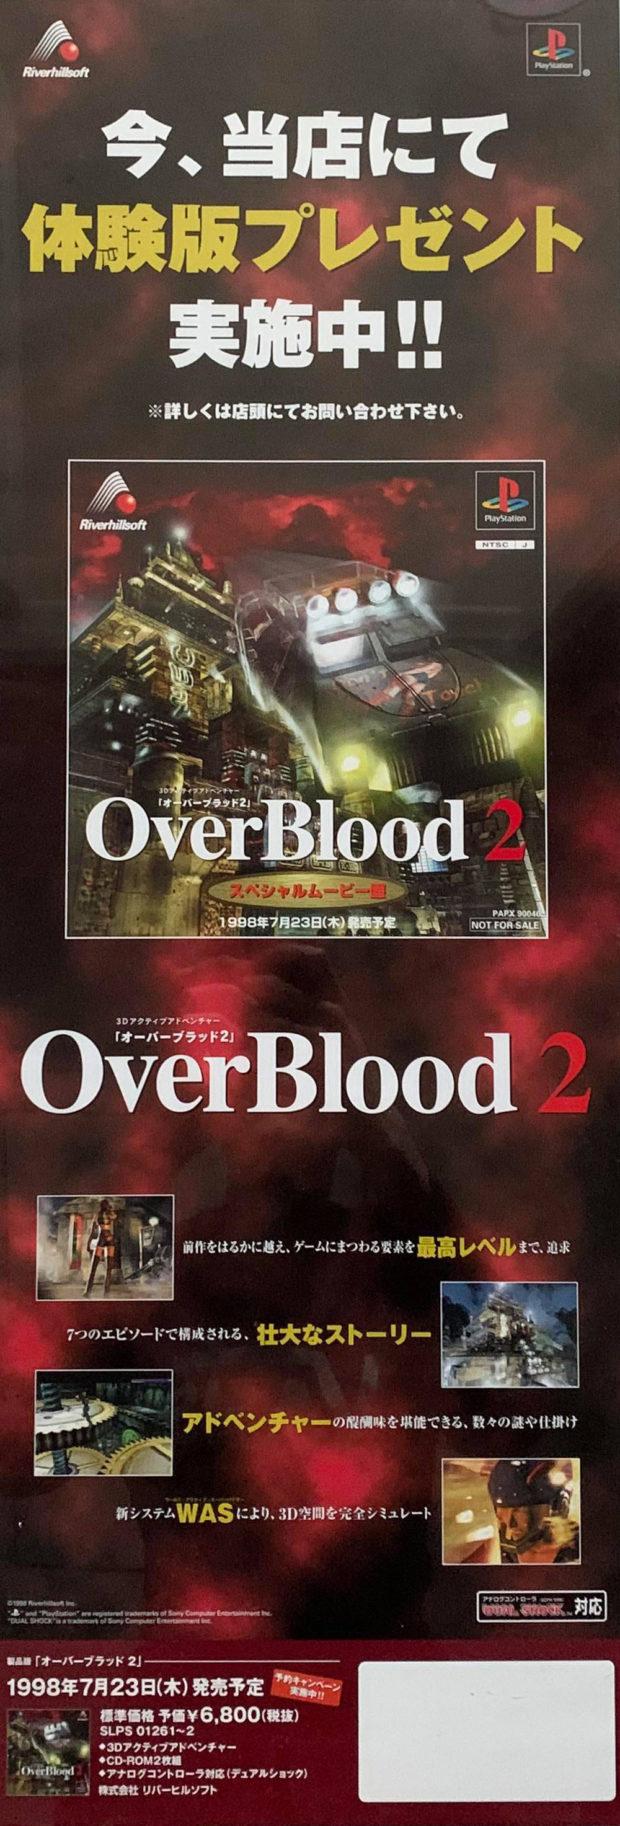 OverBlood 2 - Japan Promotional Poster